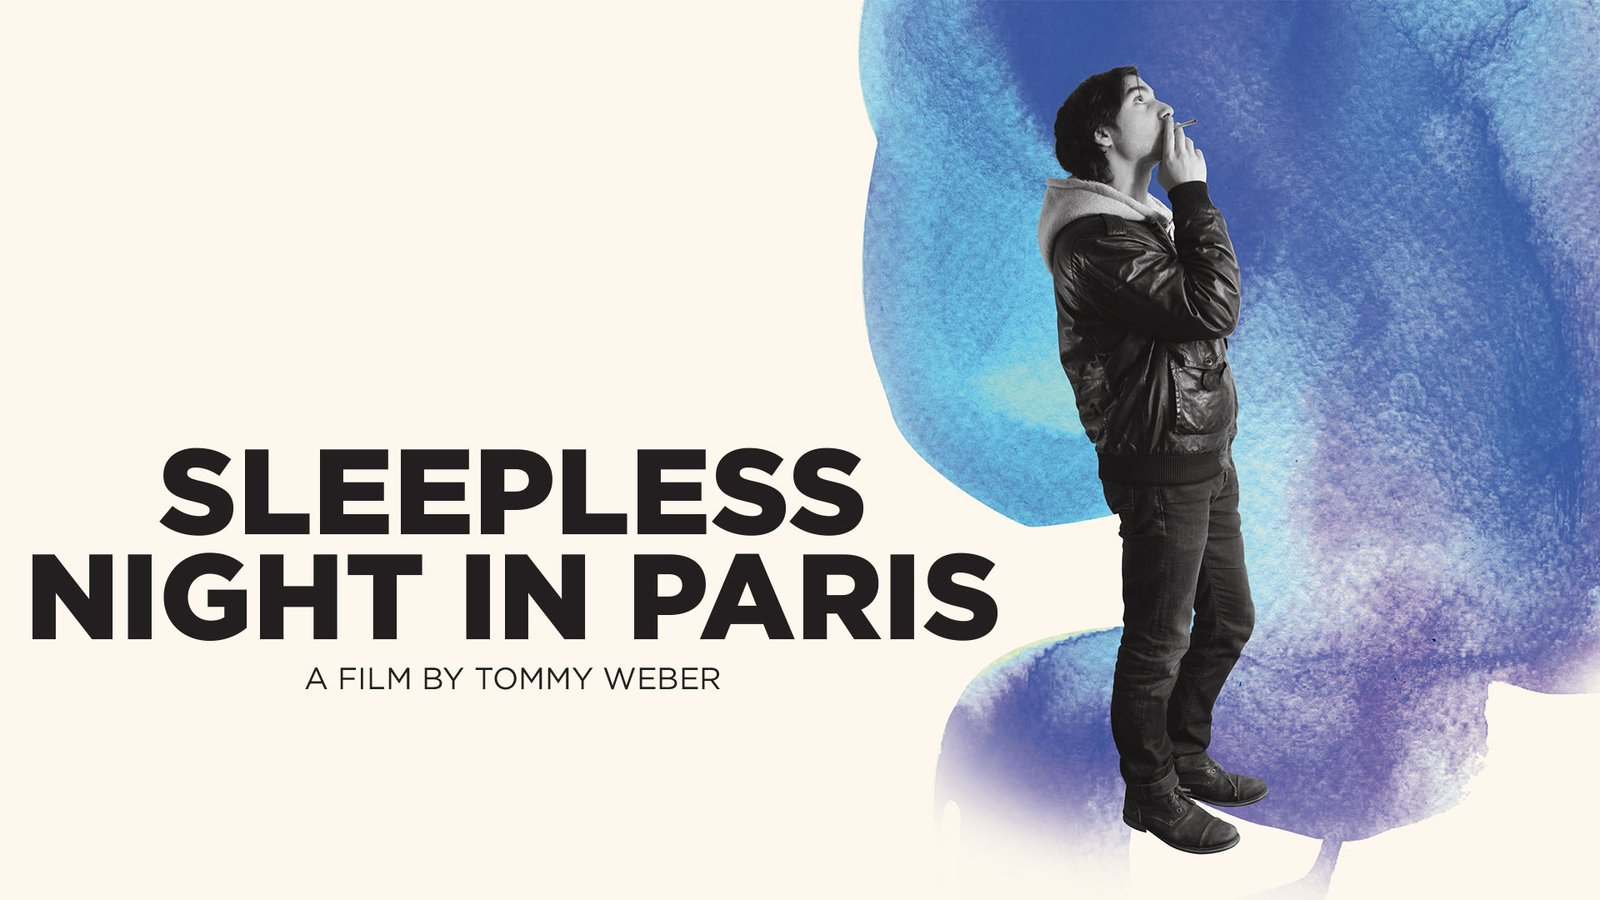 Sleepless Night in Paris - Quand Je Ne Dors Pas